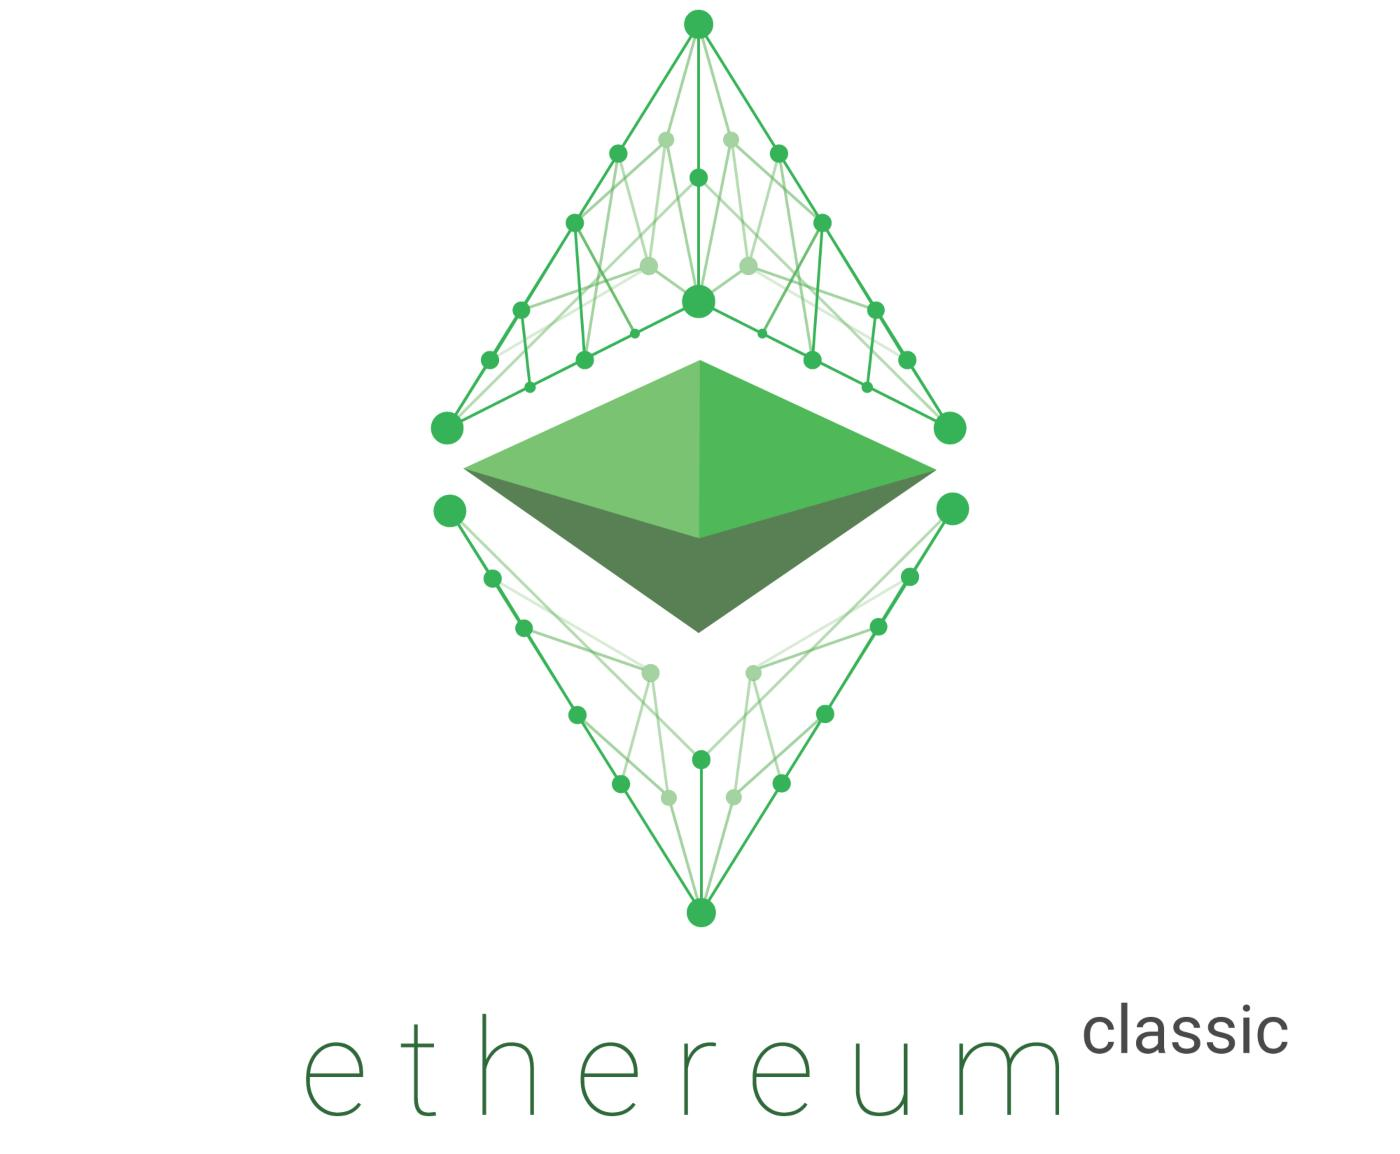 Ethereum Classic (ETC) To Undergo Magneto Hard-fork around July 21st